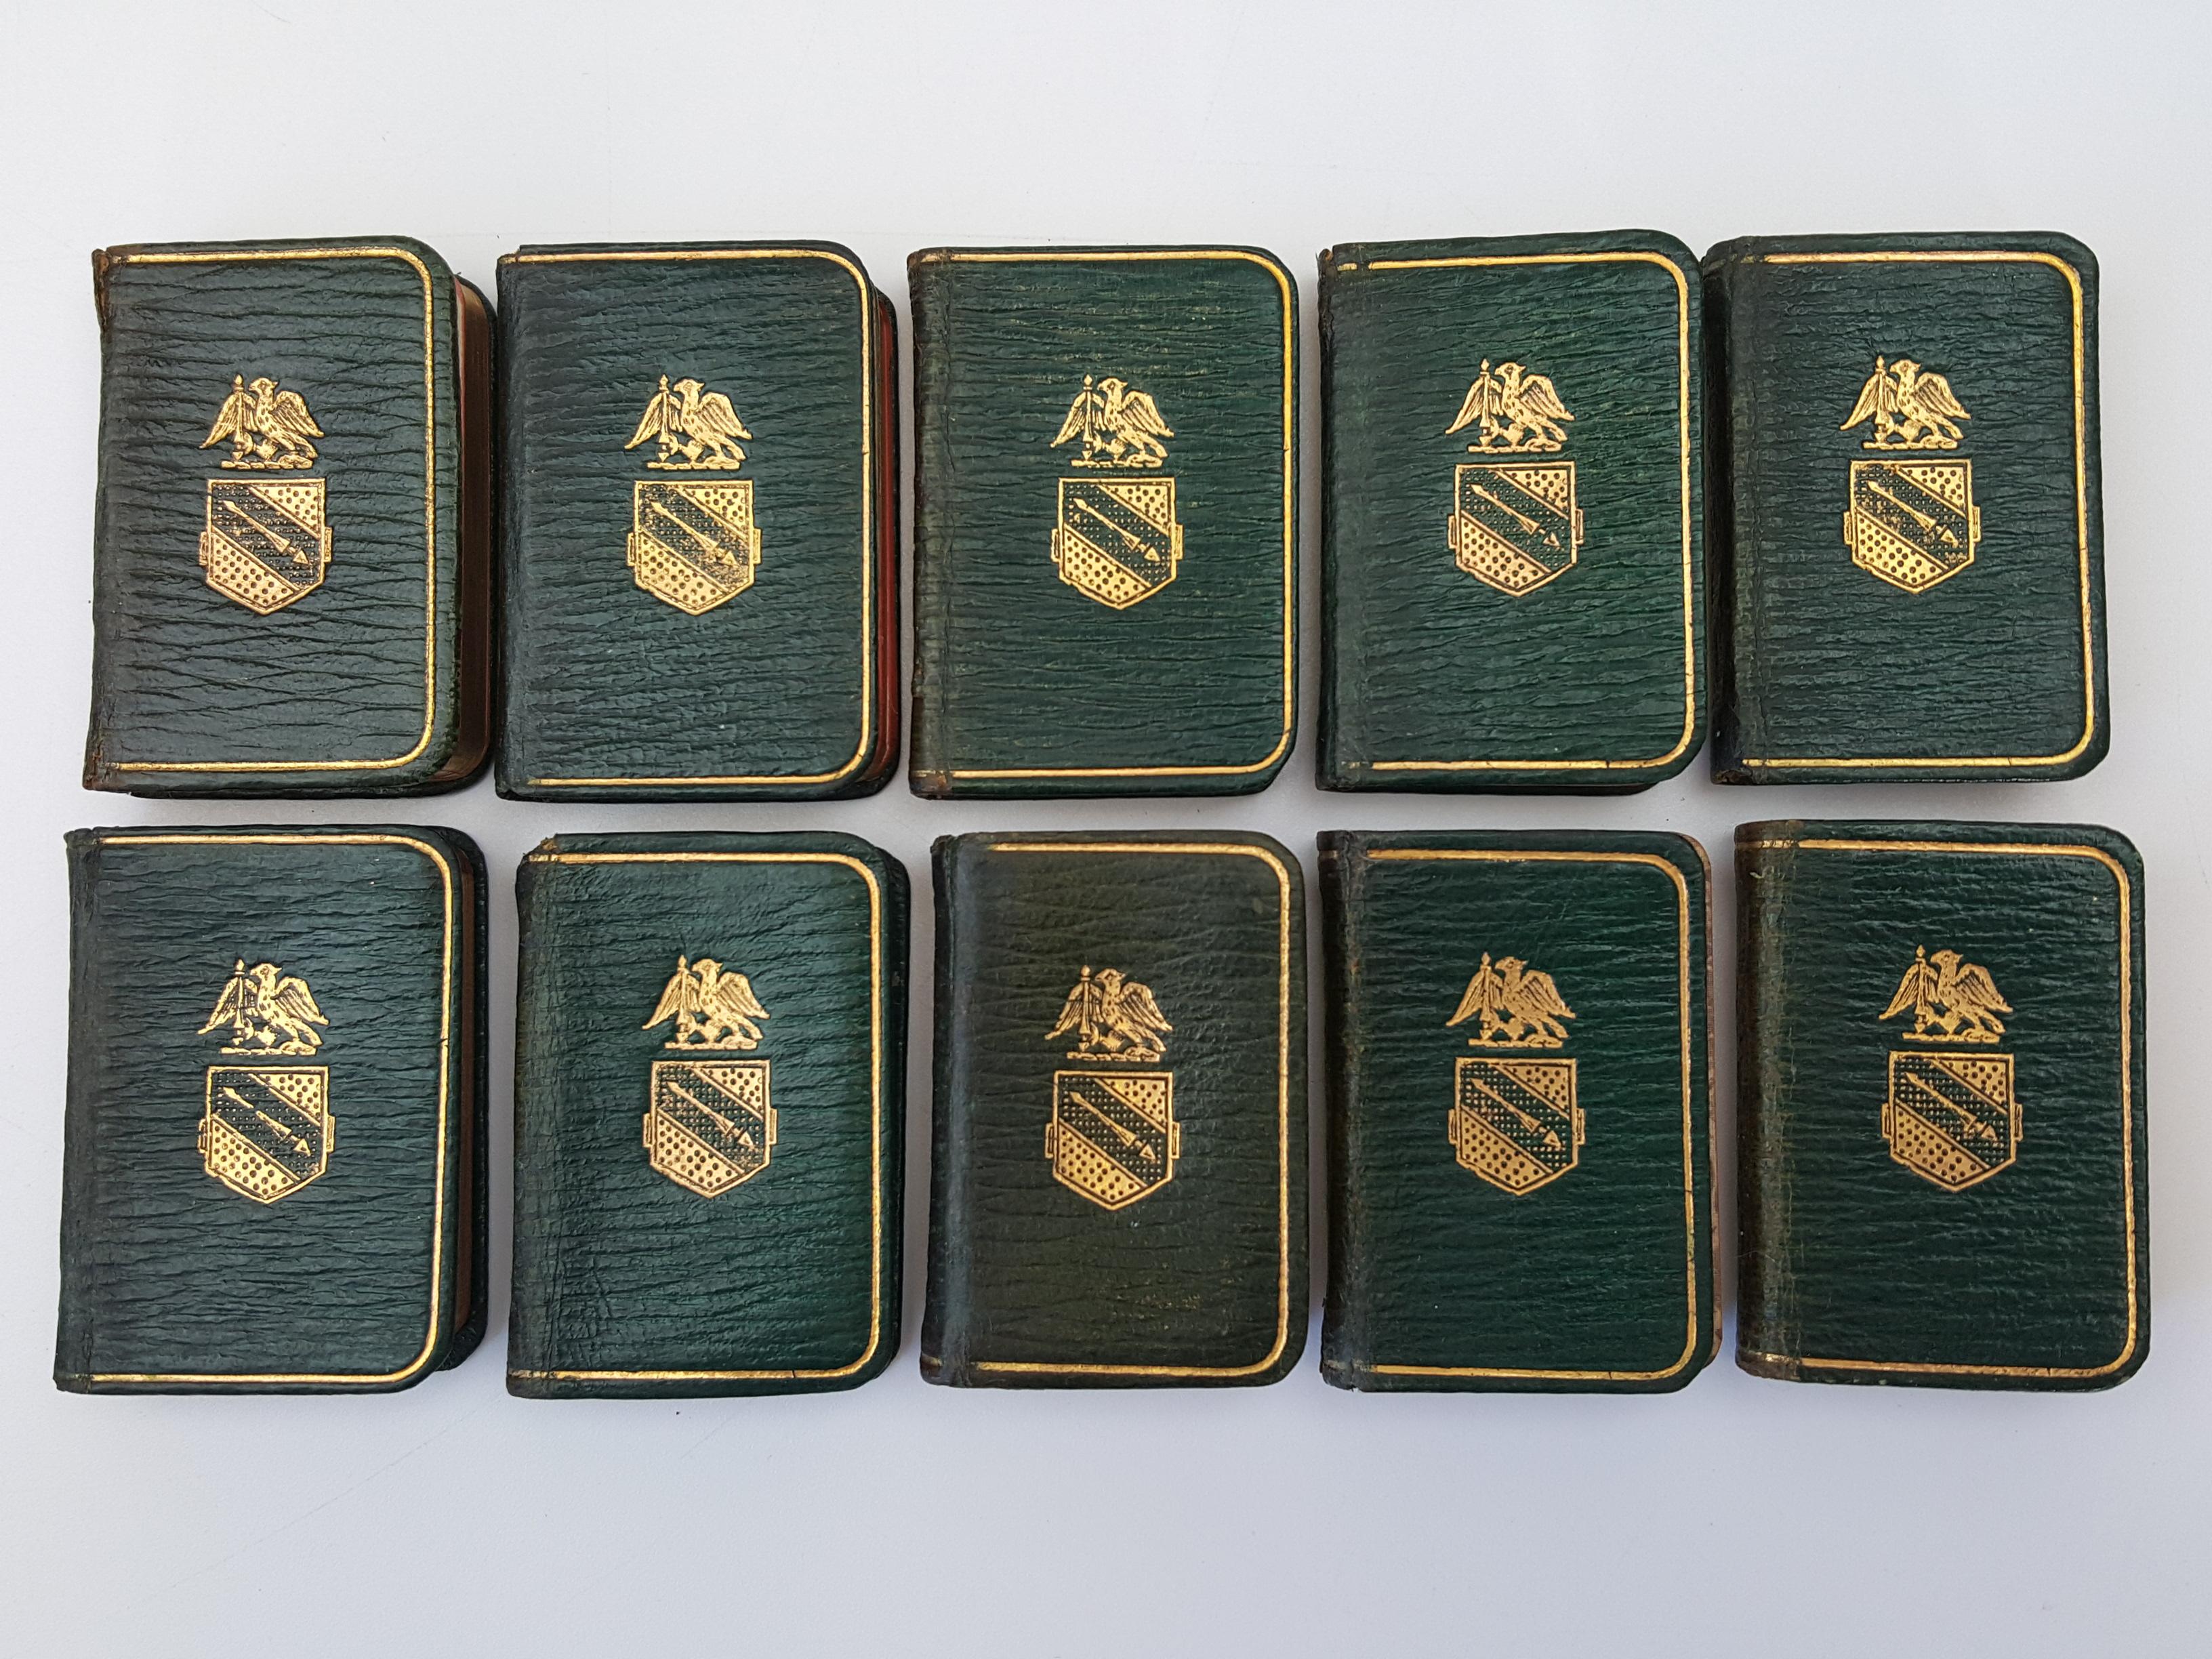 10 Miniature Volumes of Shakespeare [10 volumes]: William Shakespeare, J.